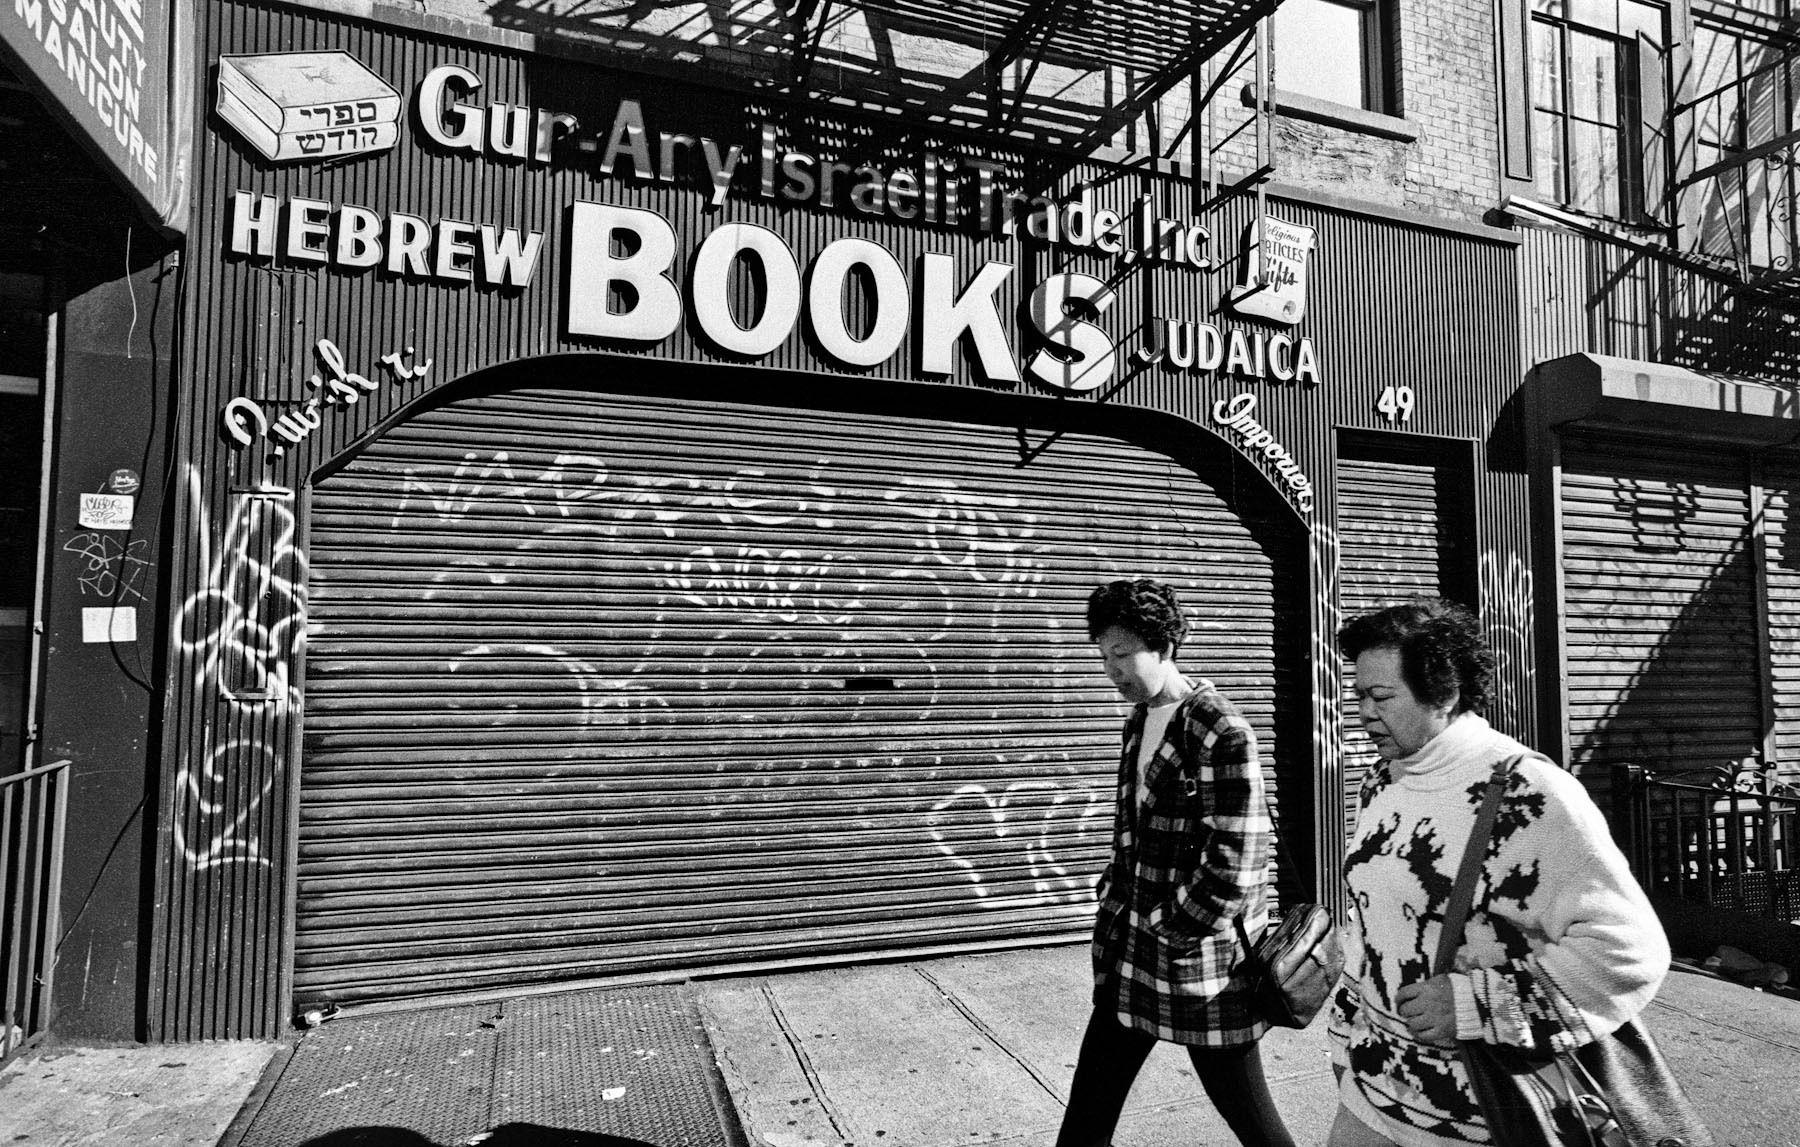 Lower East Side, New York10/20/93